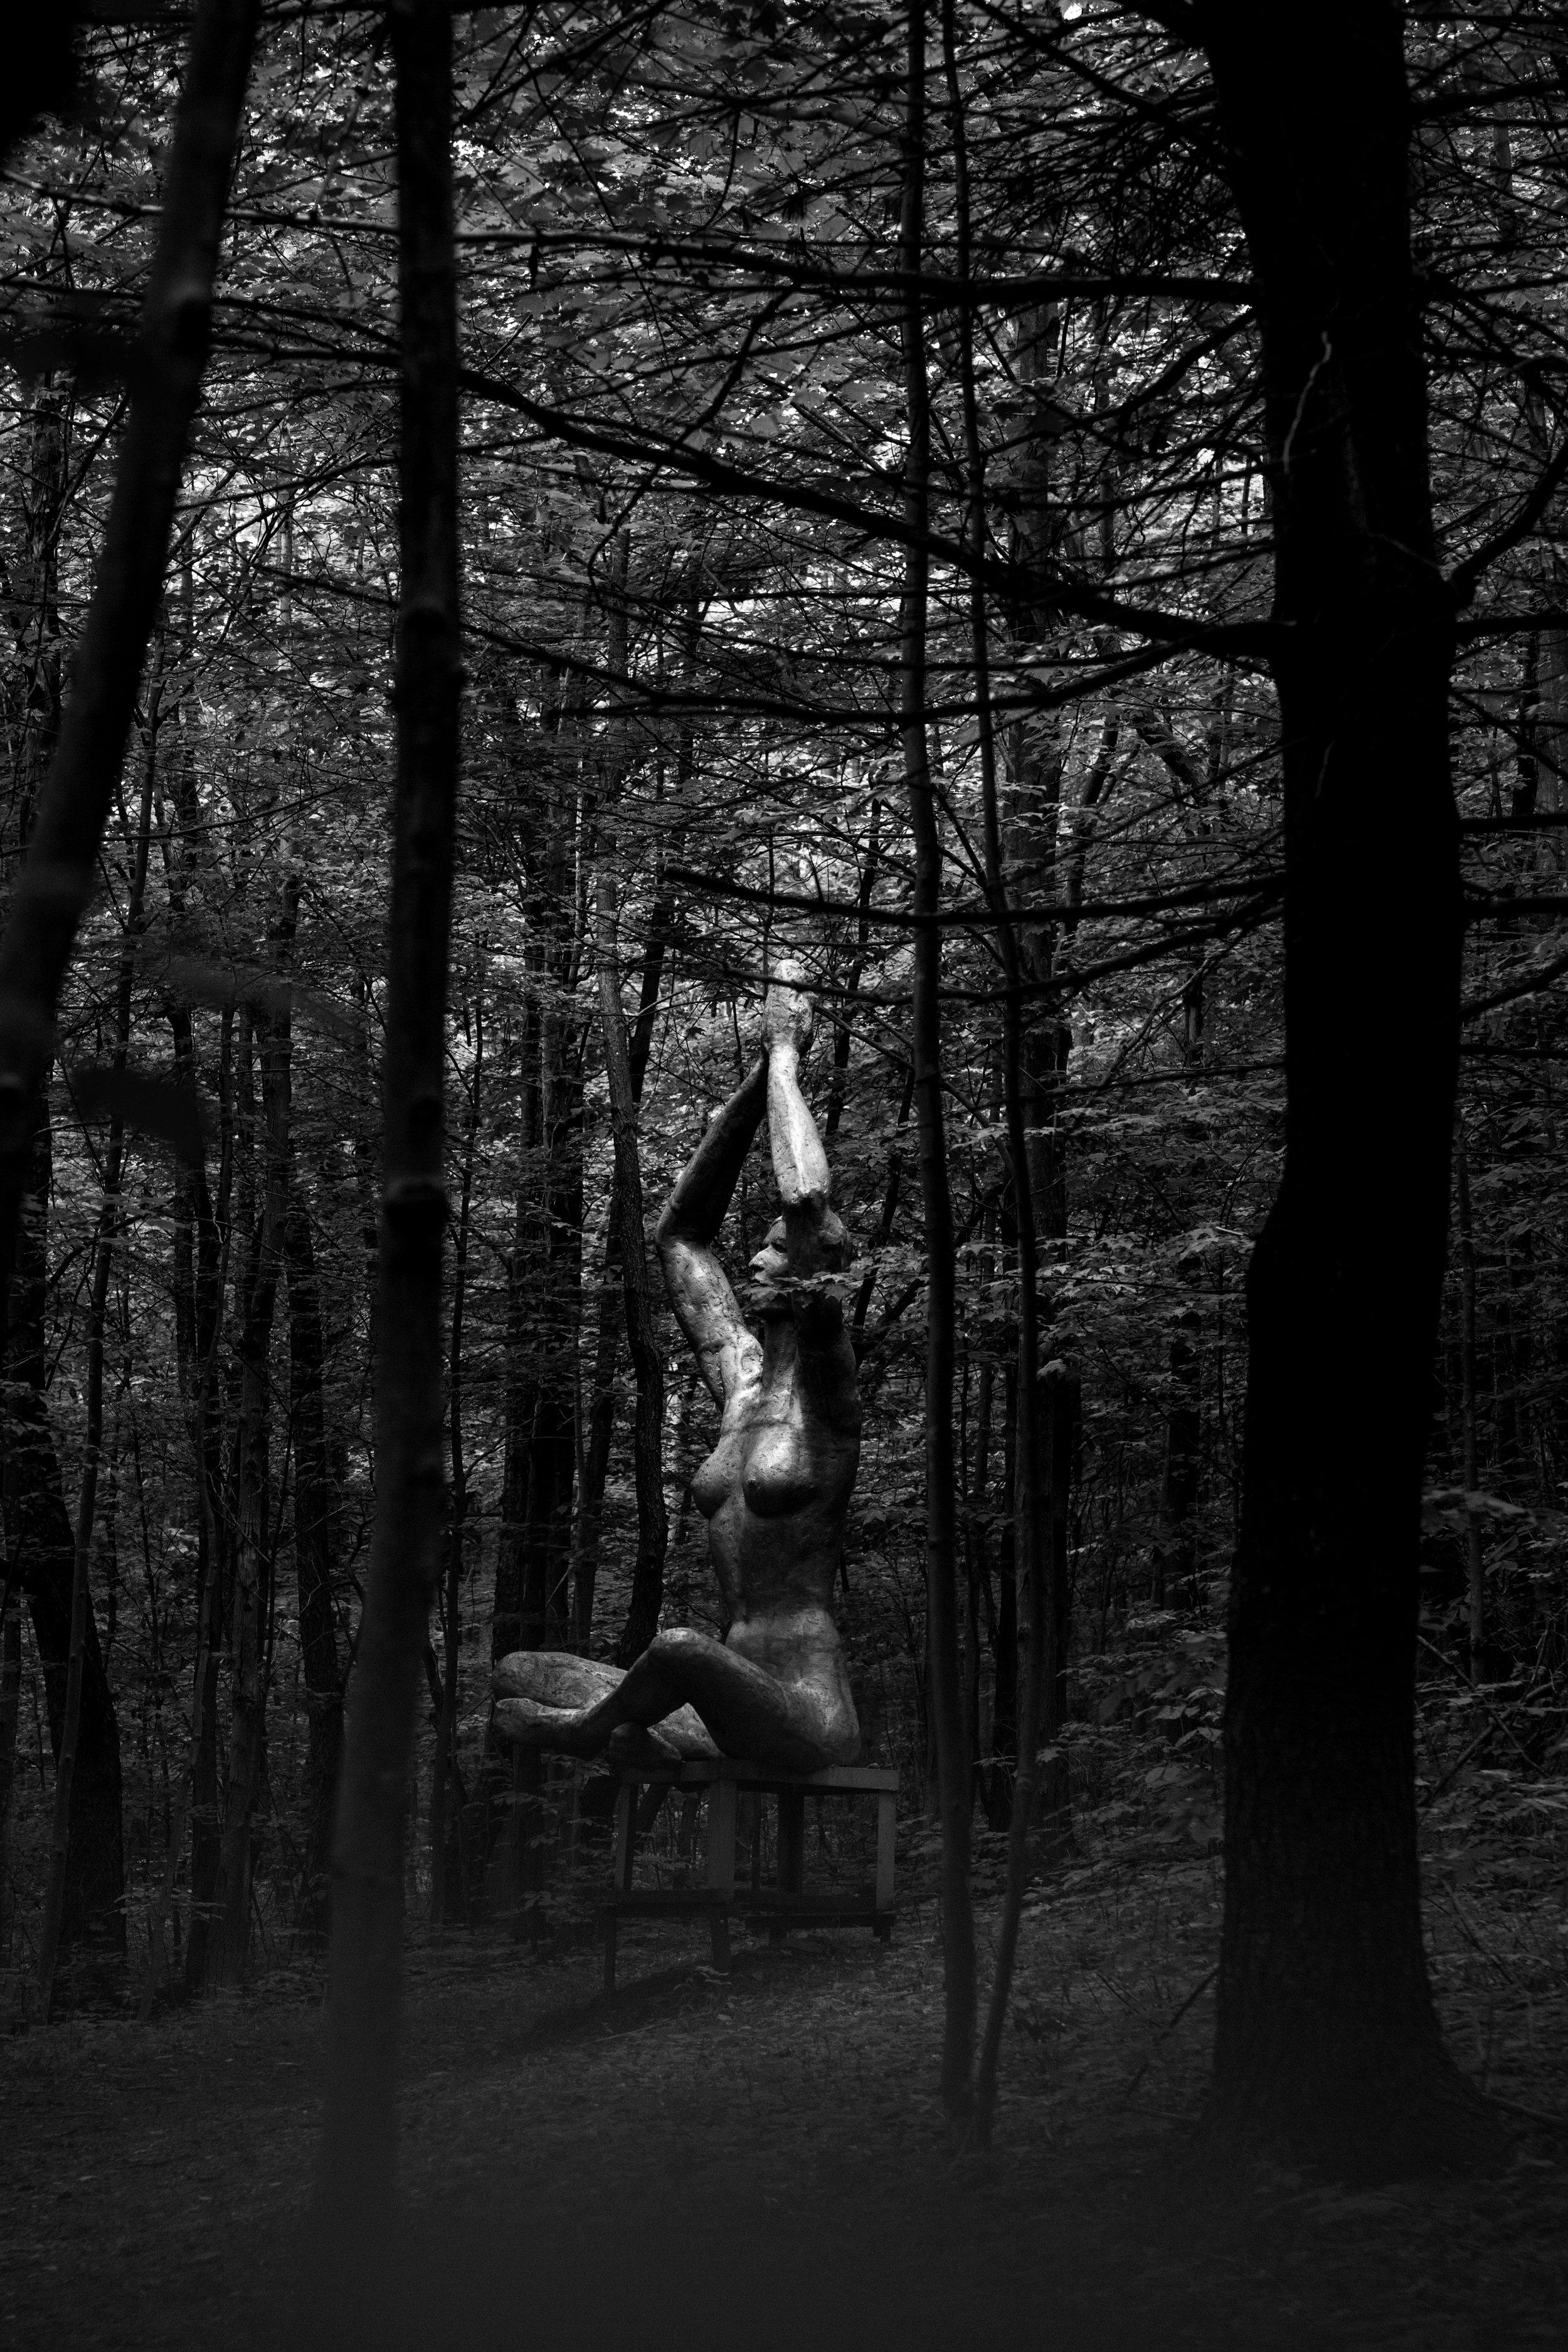 AKZPhotographySculptureparkWNYbuffaloNYPhotoimages19808.jpg